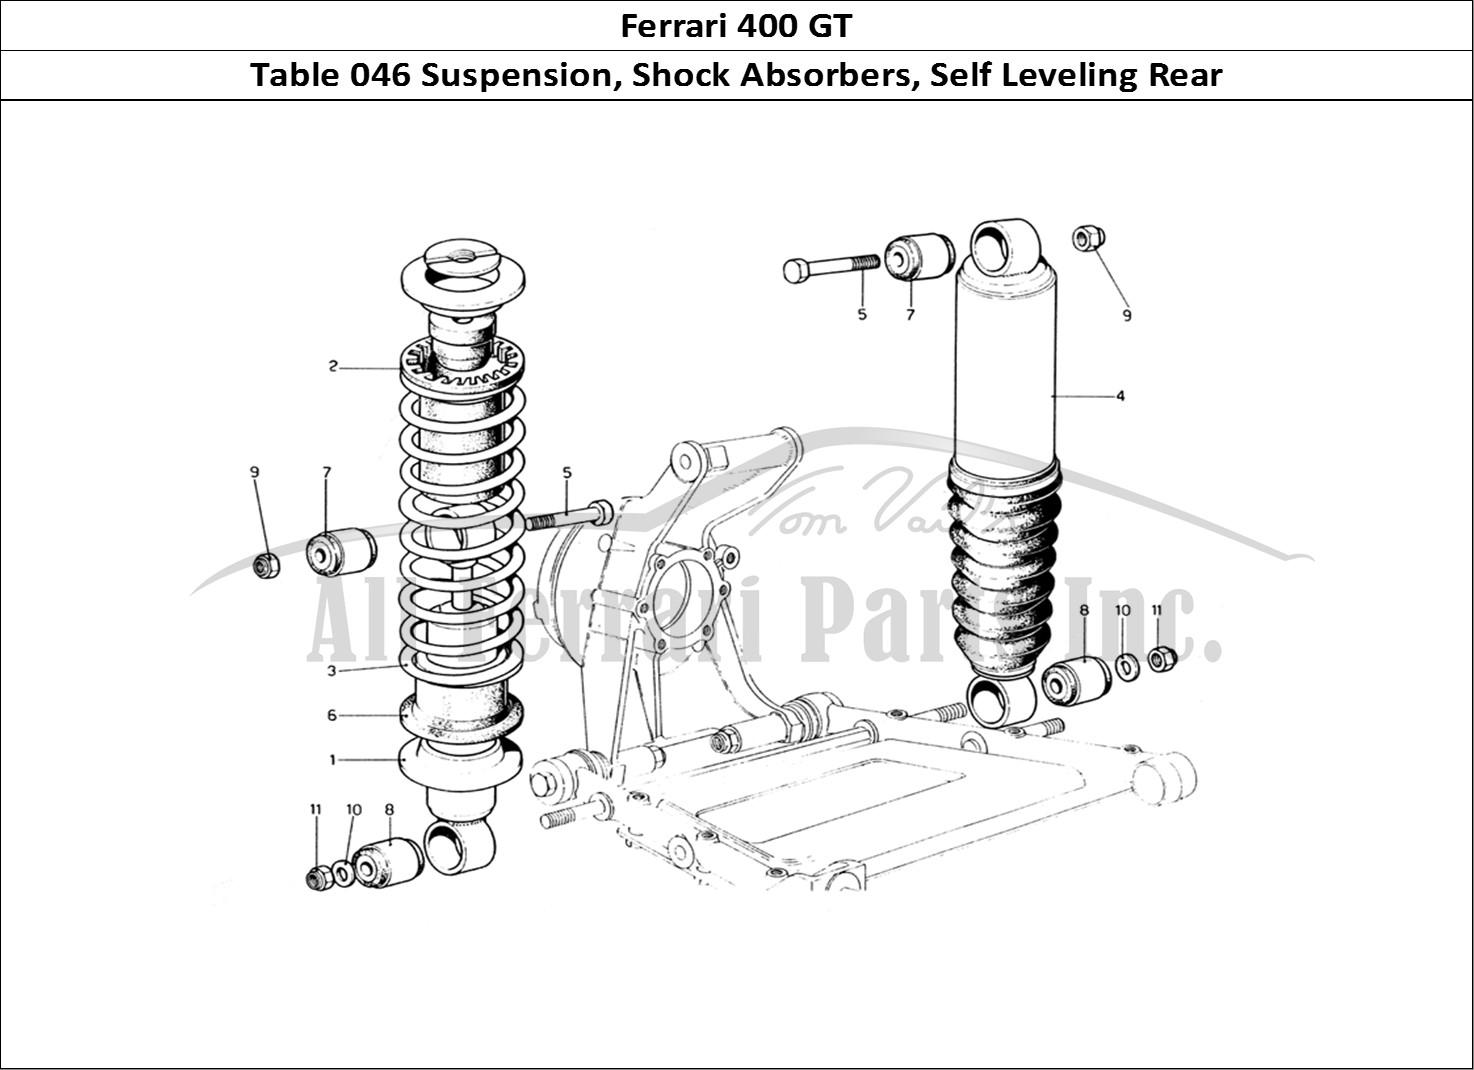 buy original ferrari 400 gt 046 suspension  shock absorbers  self leveling rear ferrari parts